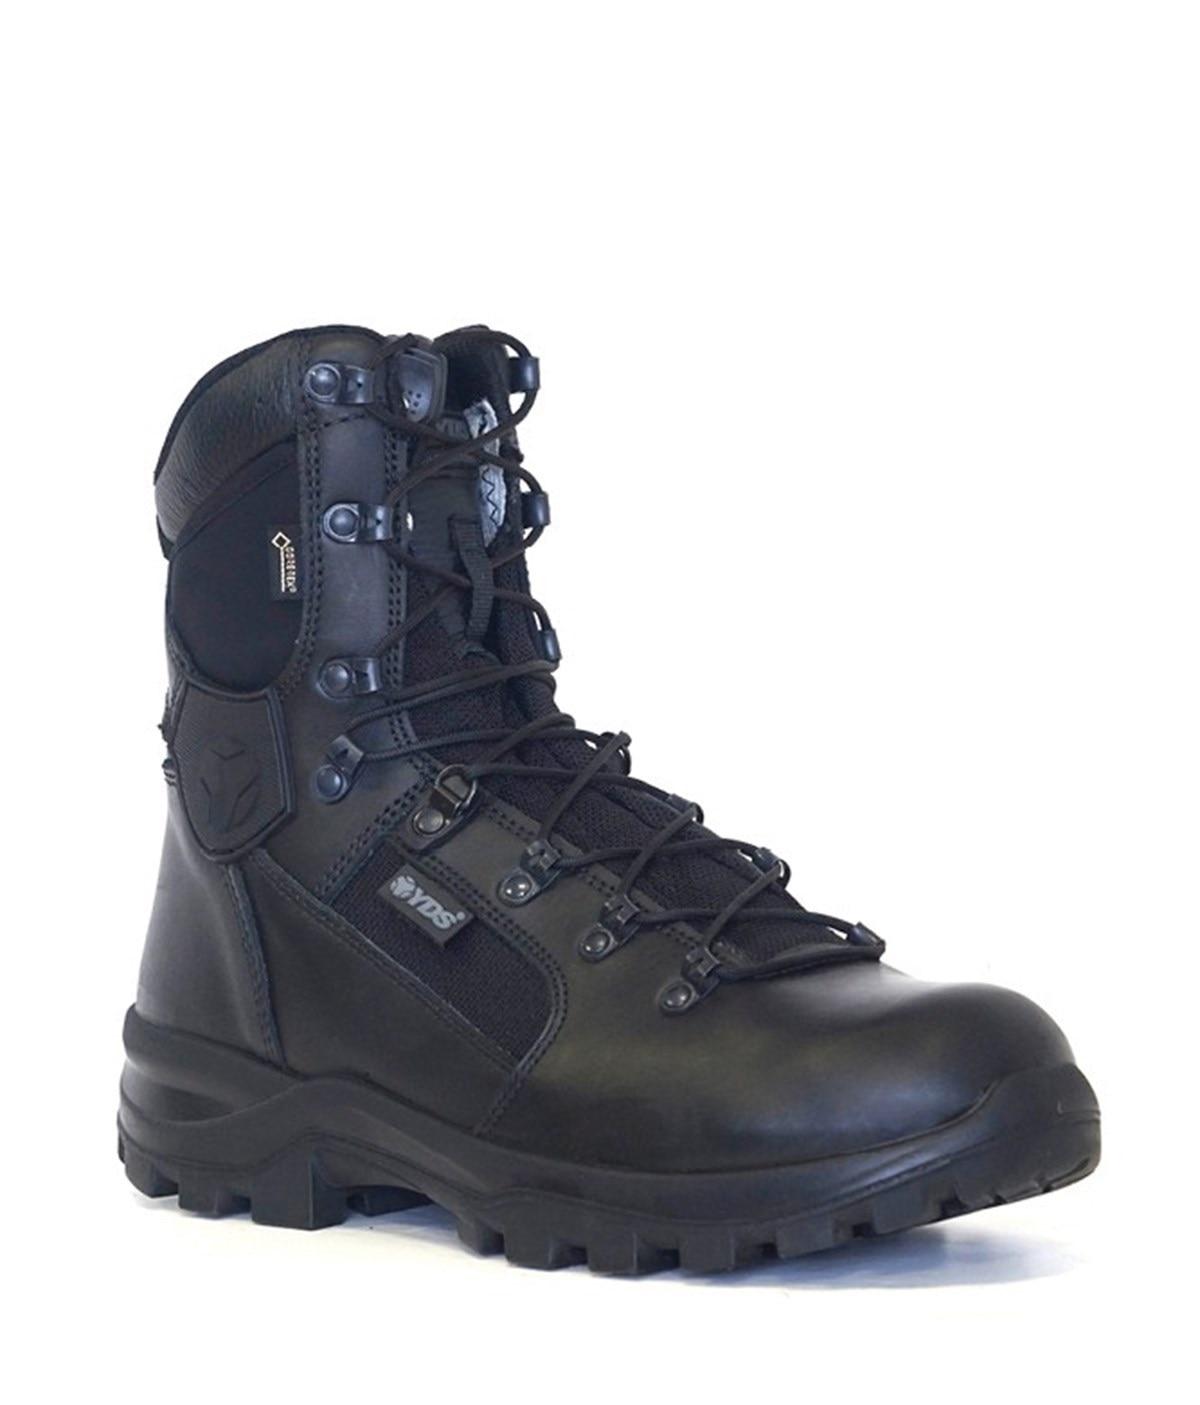 YDS المتطرفة الأسود GTX الأحذية اليومية والتشغيلية ، GORATEX ، العسكرية